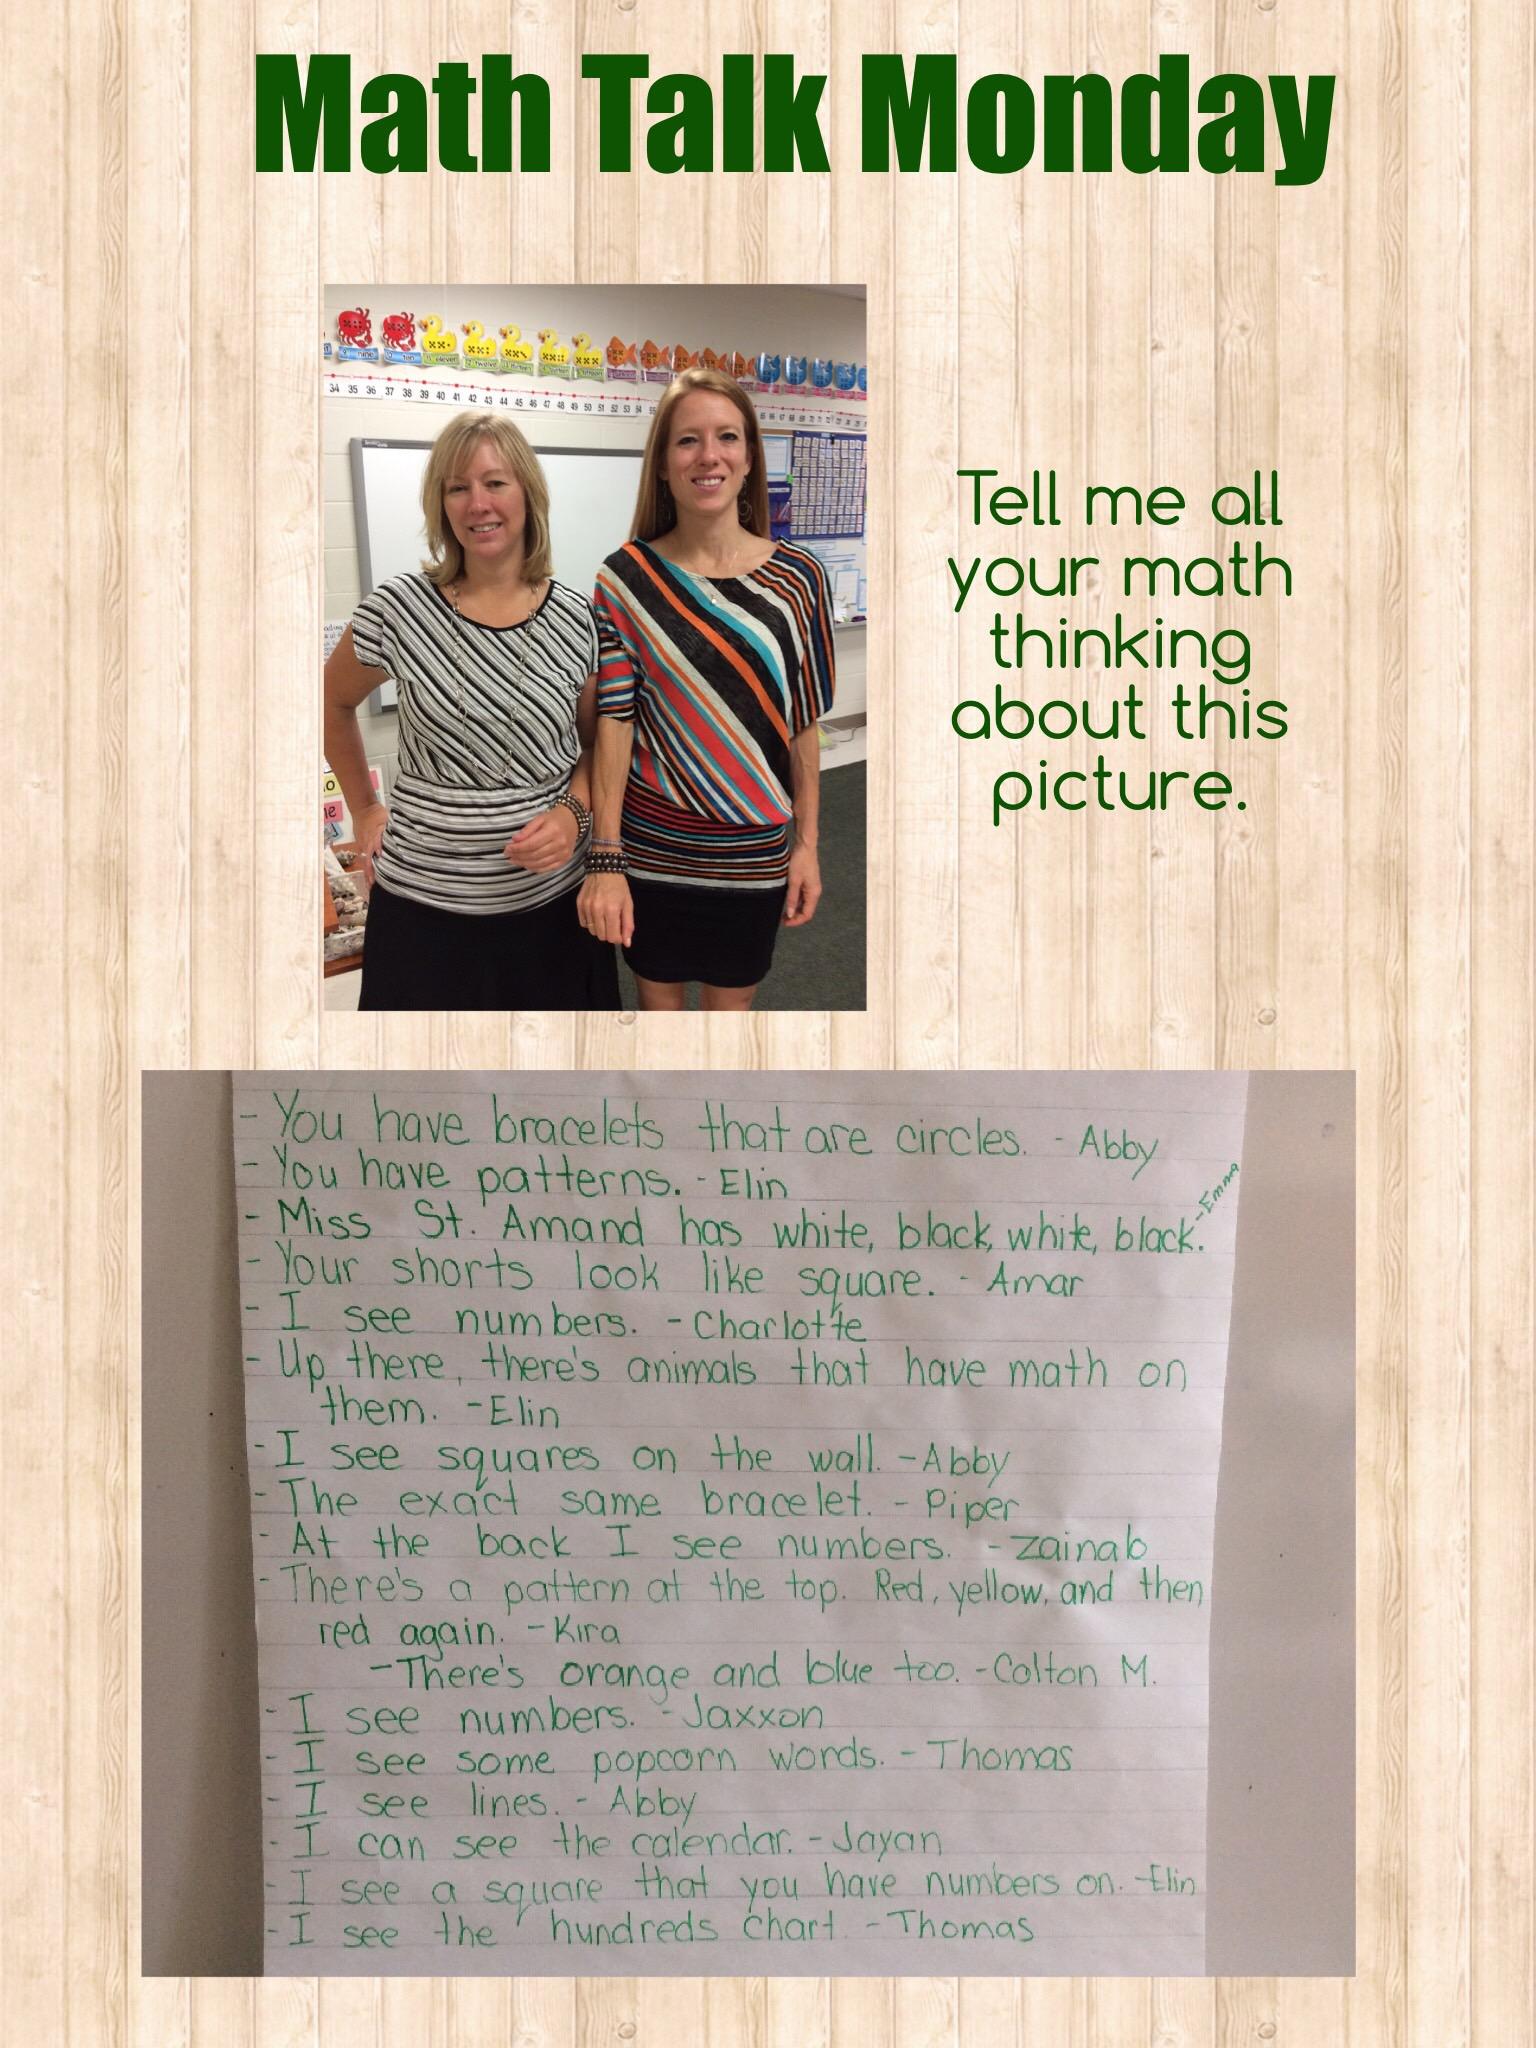 Math Talk Monday